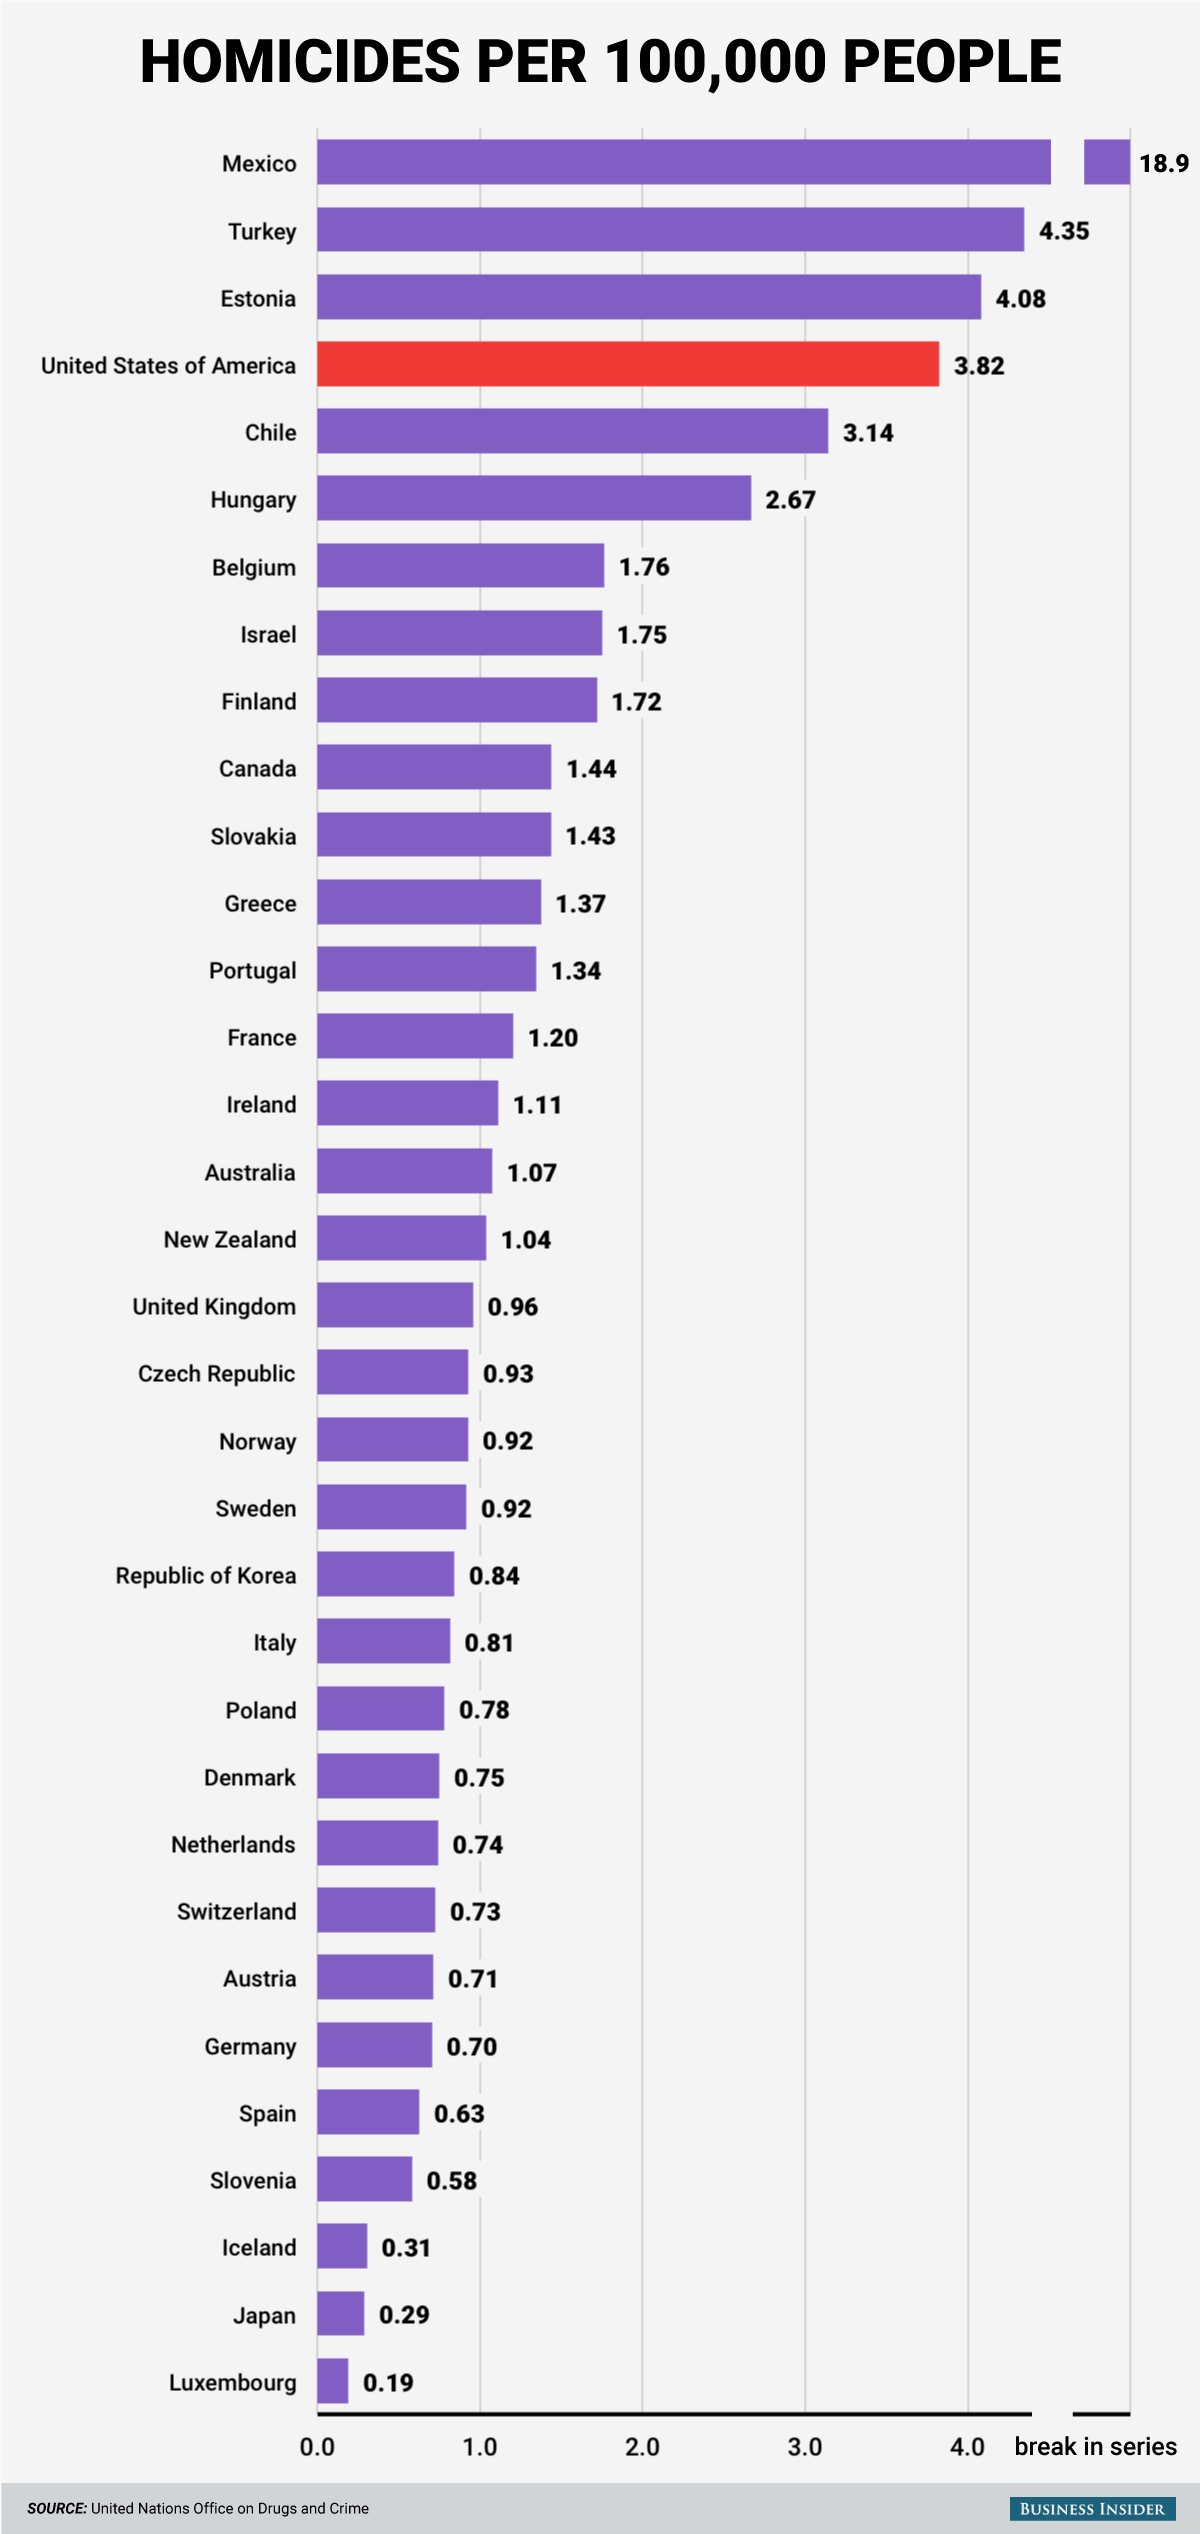 OECD homicide rates